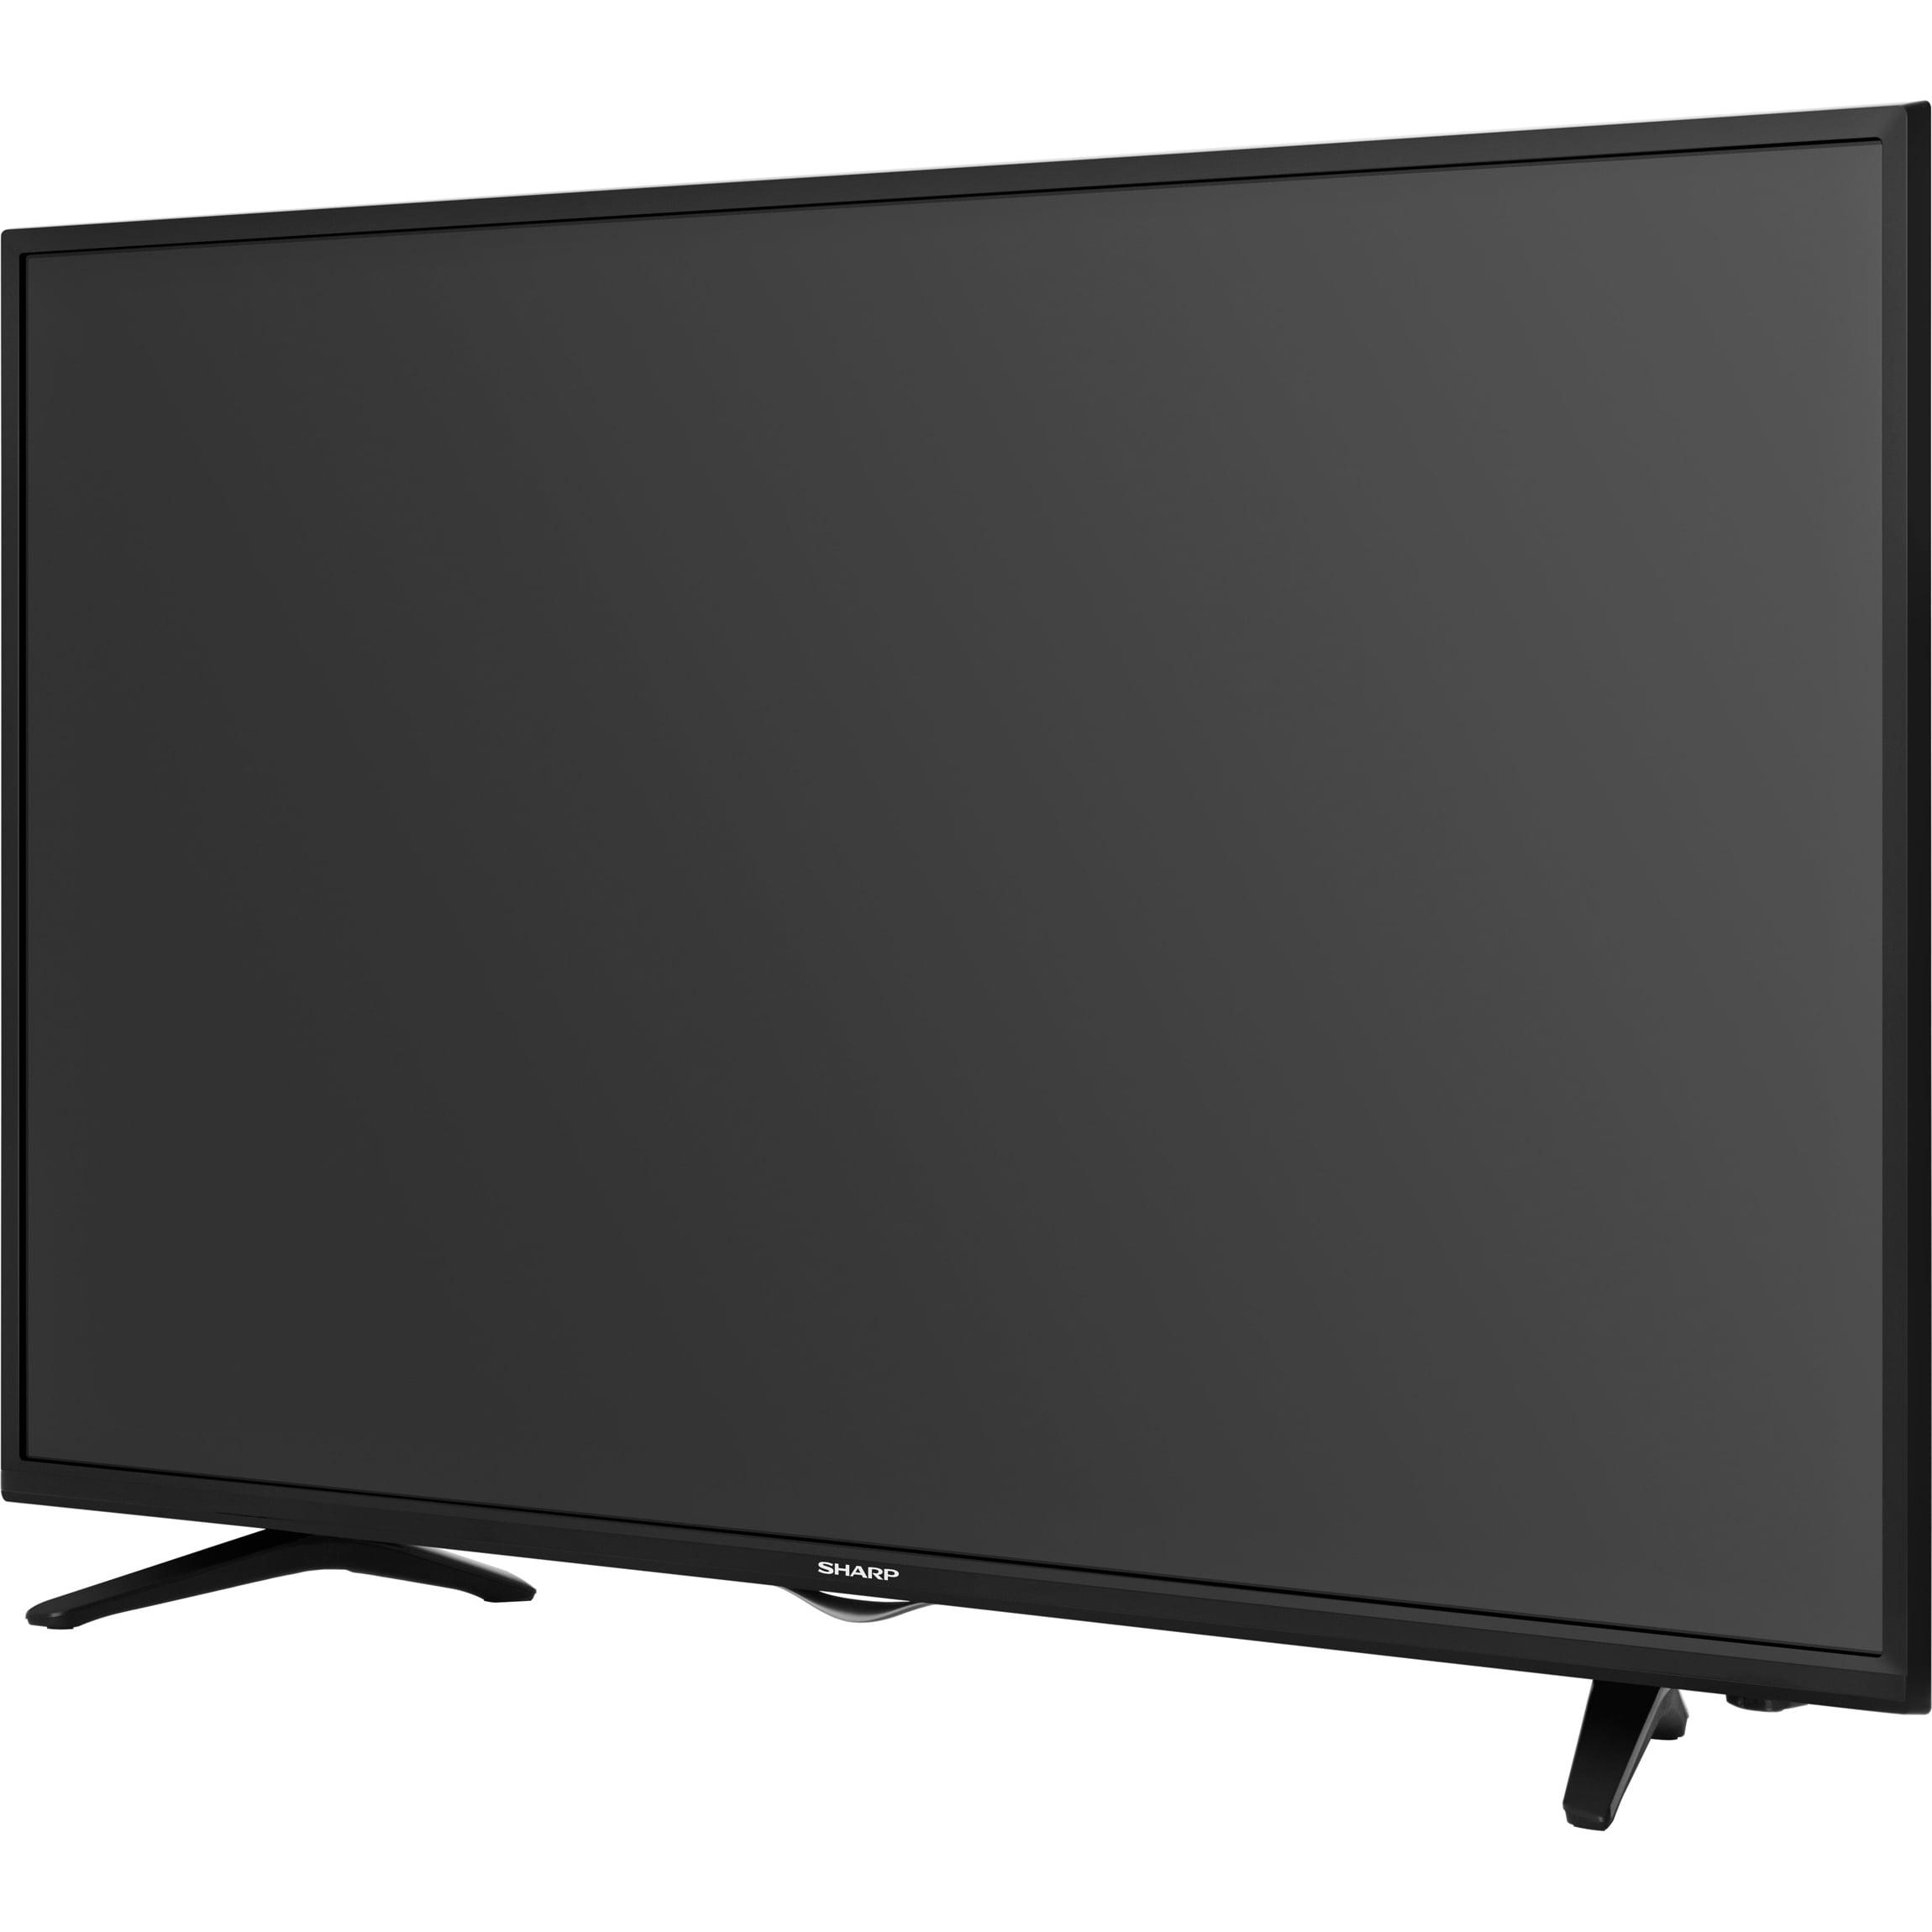 Refurbished Sharp 43'' Class FHD (1080P) Smart LED TV (LC-43P5000U) by Sharp